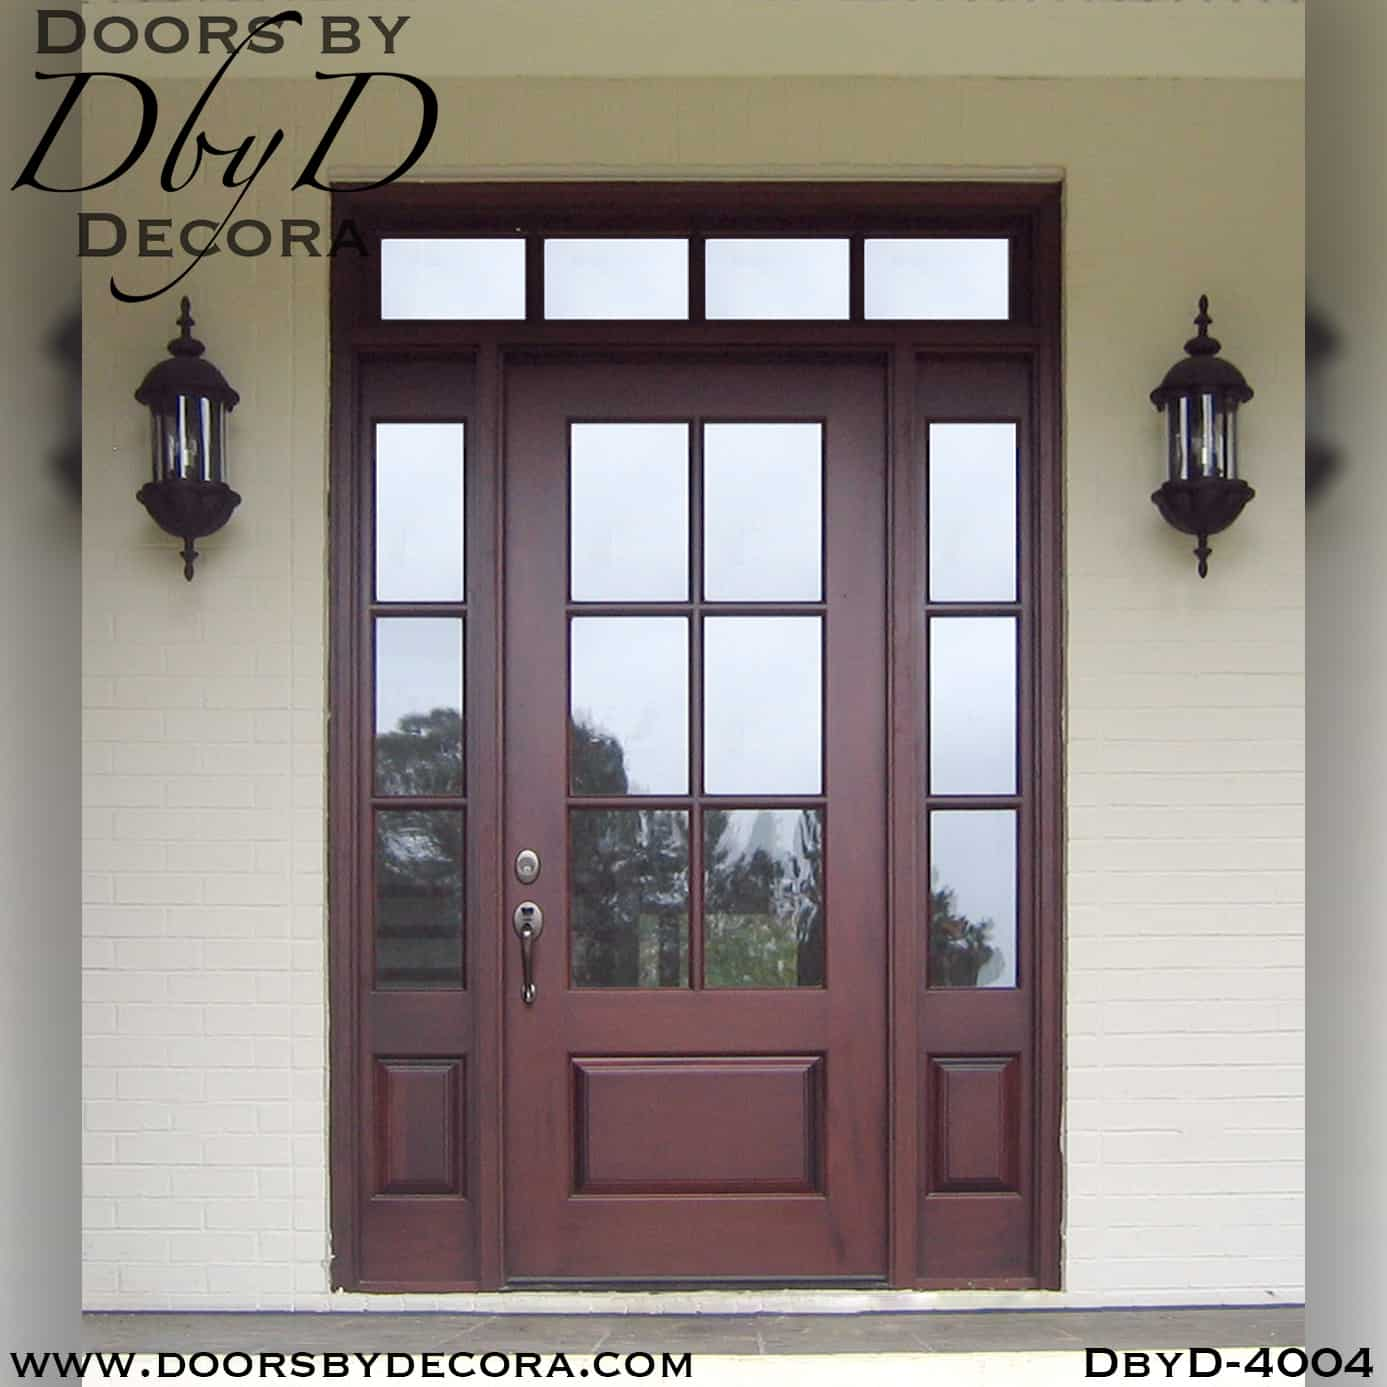 Custom Craftsman Door With Transom Wood Entry Doors By Decora